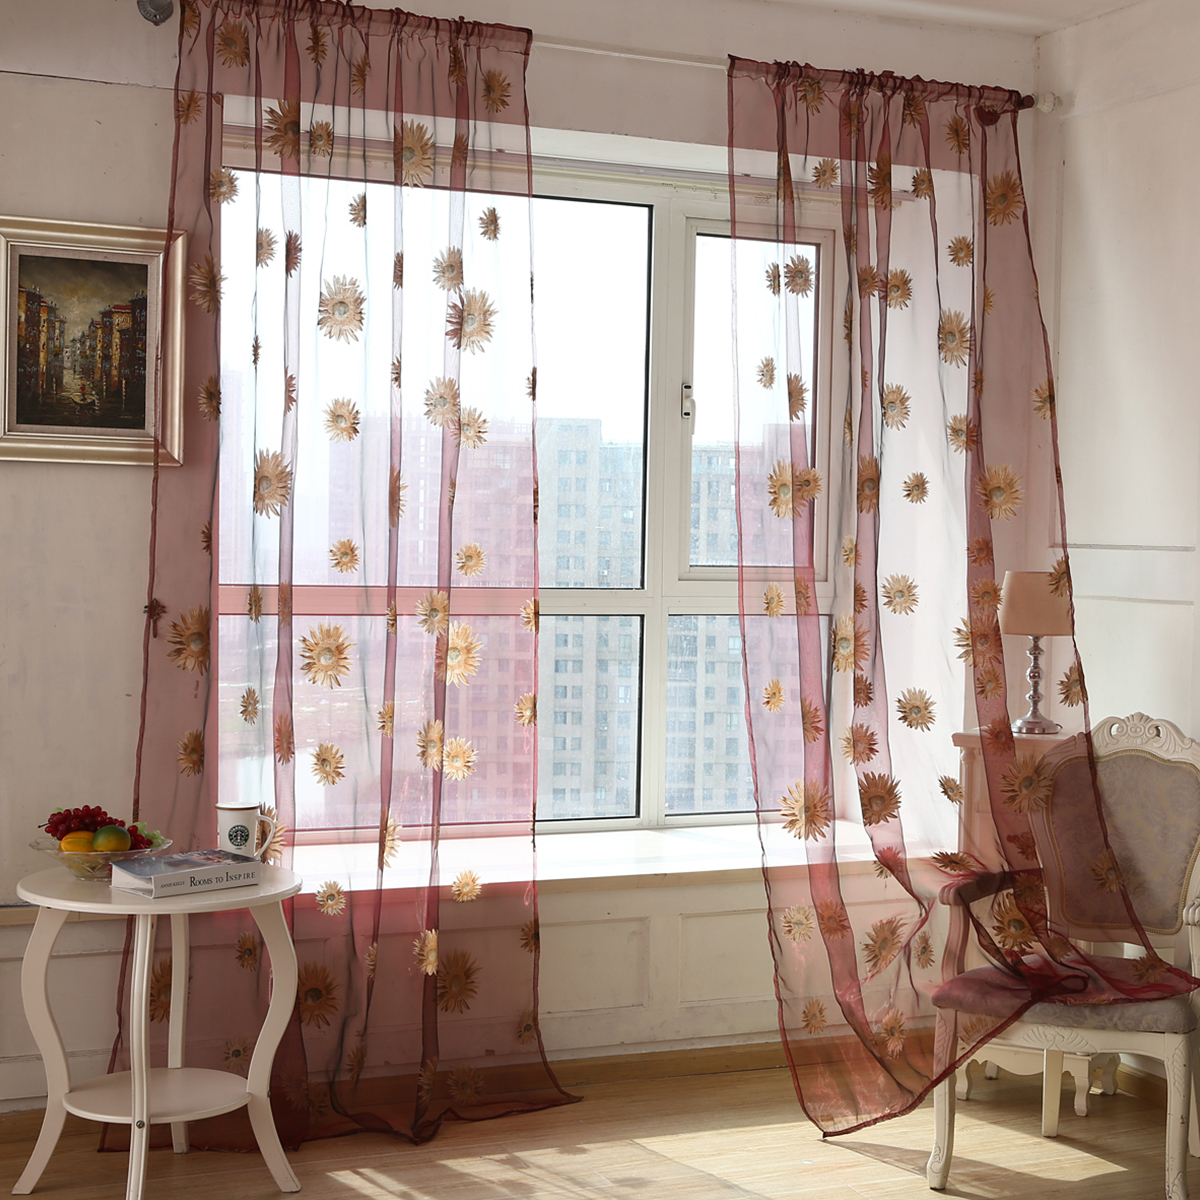 1//2 Panel Net Voile Curtains Slot Top Sheer Curtain Window Sliding Door Decor UK